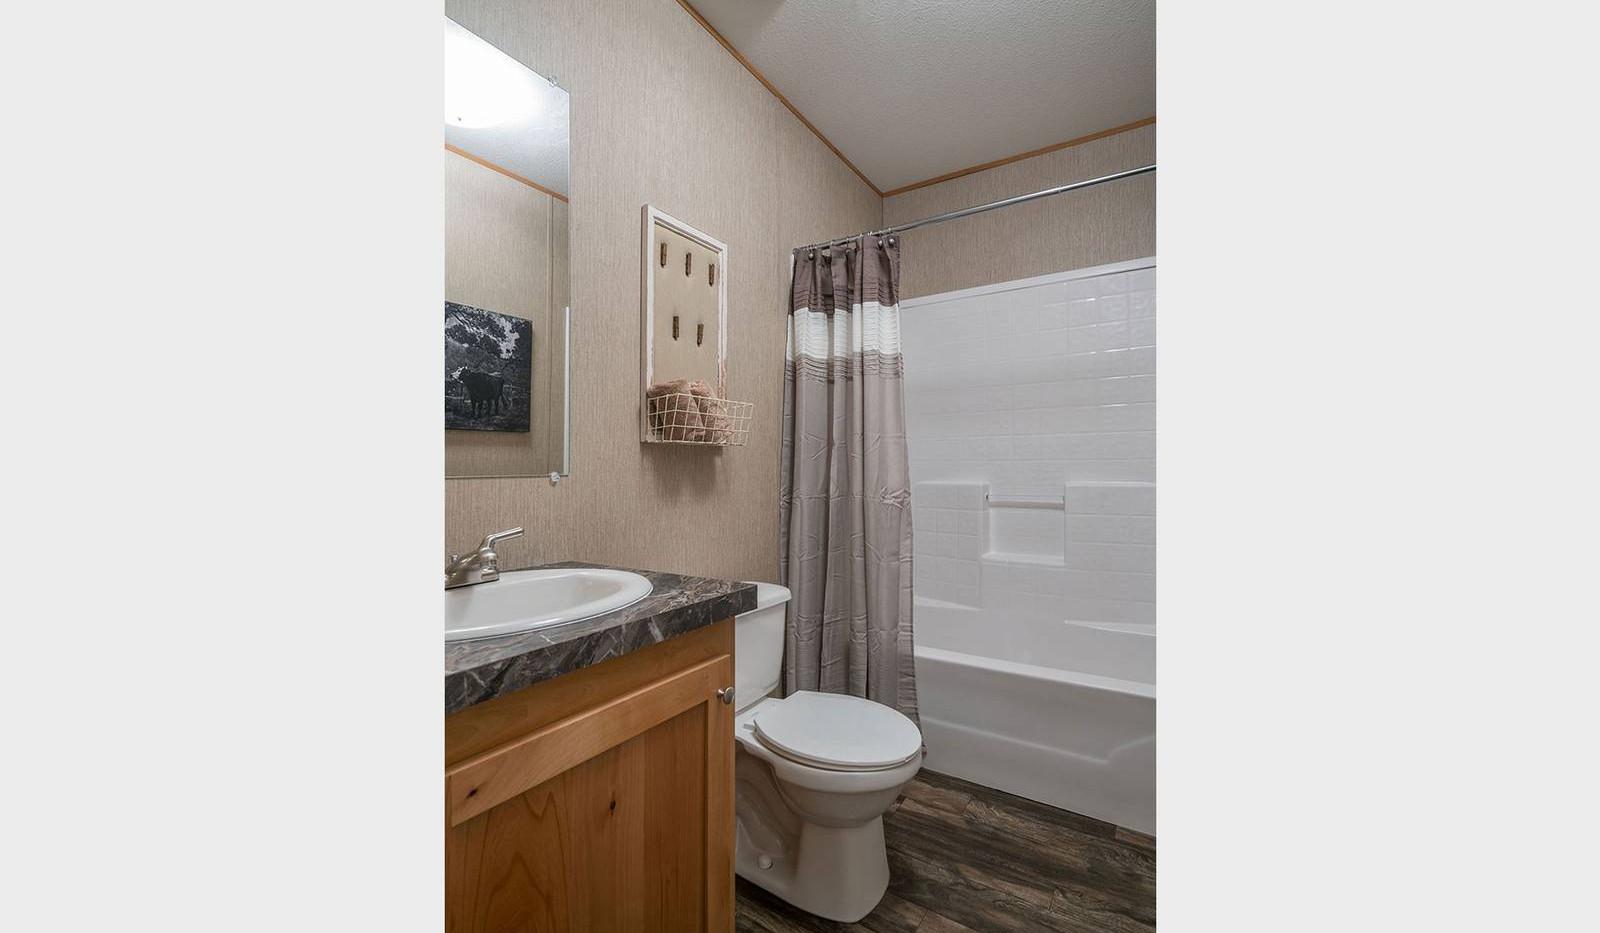 8-select-1676c-bathroom-1600x1067.jpg